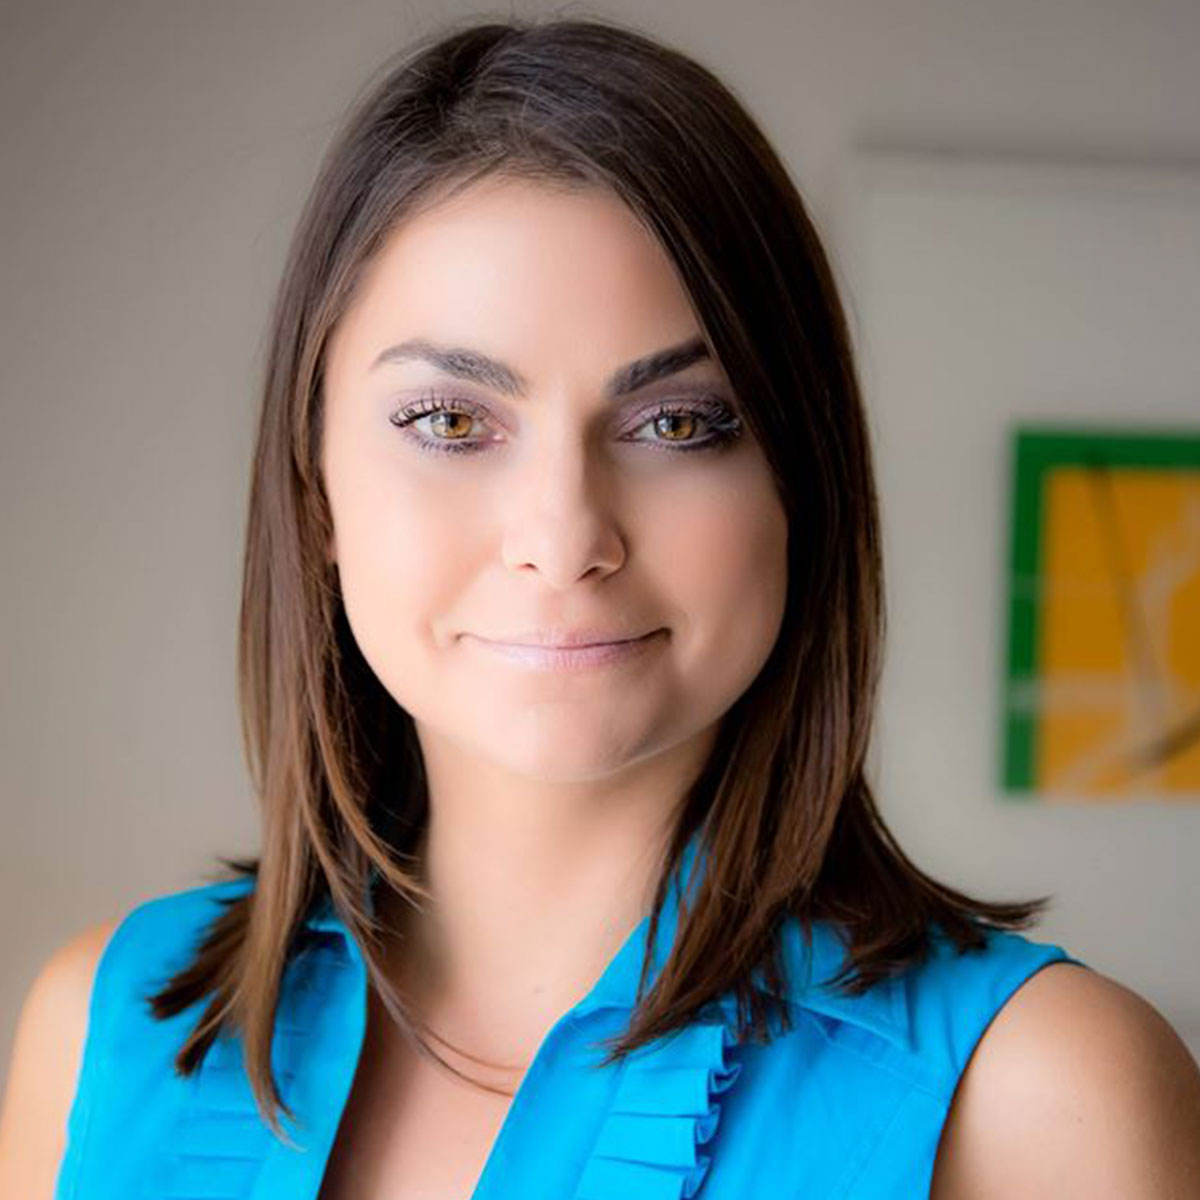 Global Academy of Coaching - Professor, Course Director, Jill Douka